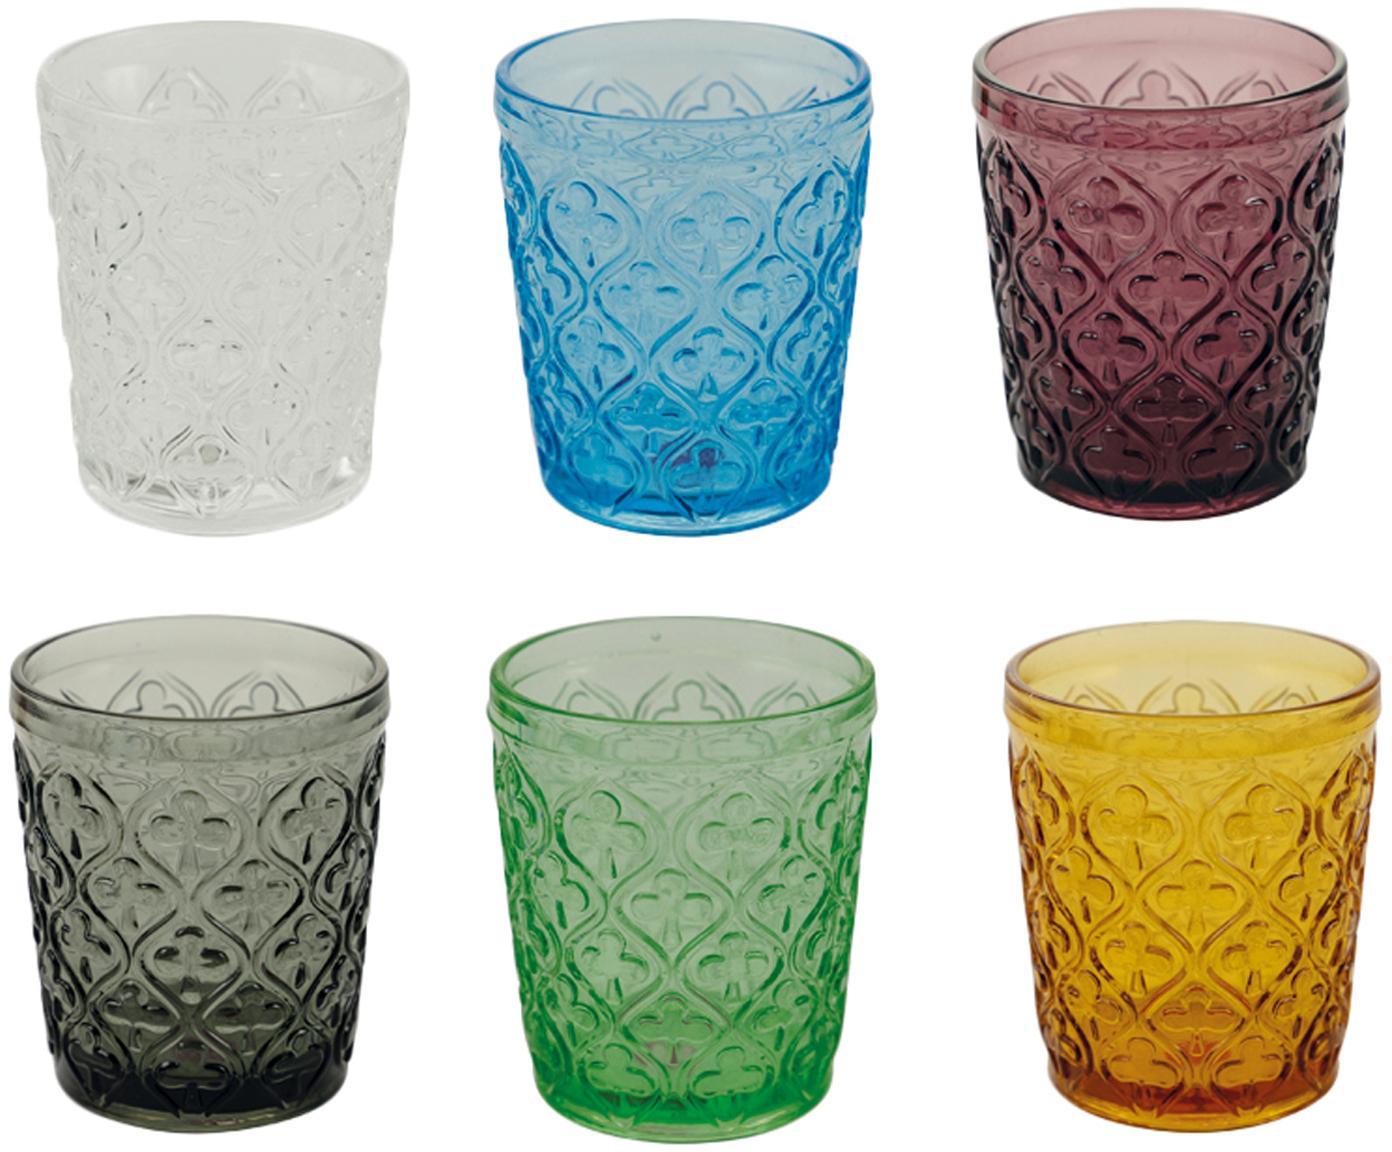 Waterglazenset Marrakech, 6-delig, Glas, Blauw, lila, grijs, groen, geel, transparant, Ø 8 x H 10 cm